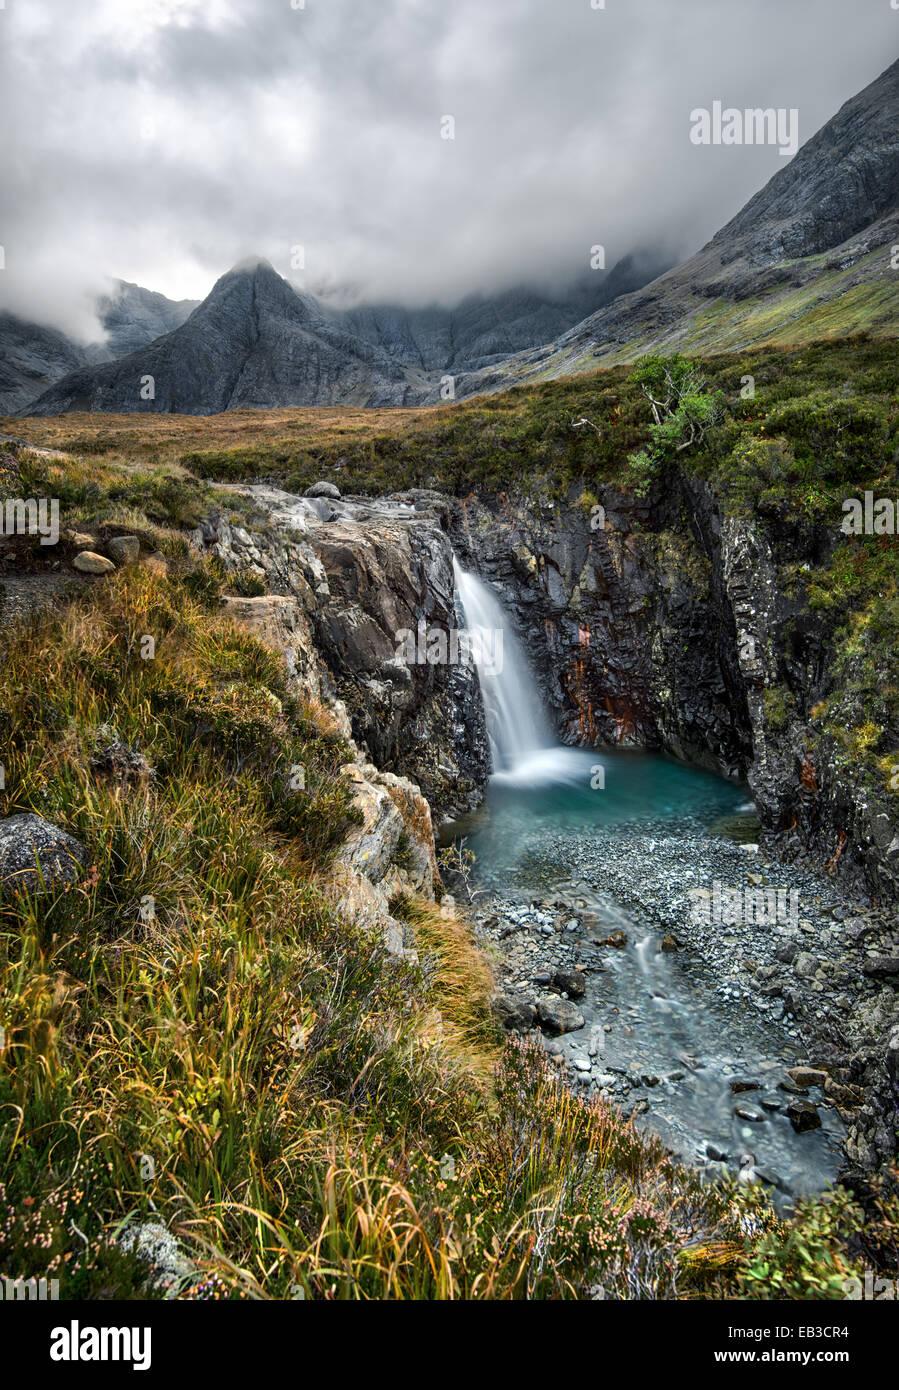 Germany/Deutschland, Fairy Pools Wasserfall am nebligen Tag Stockbild